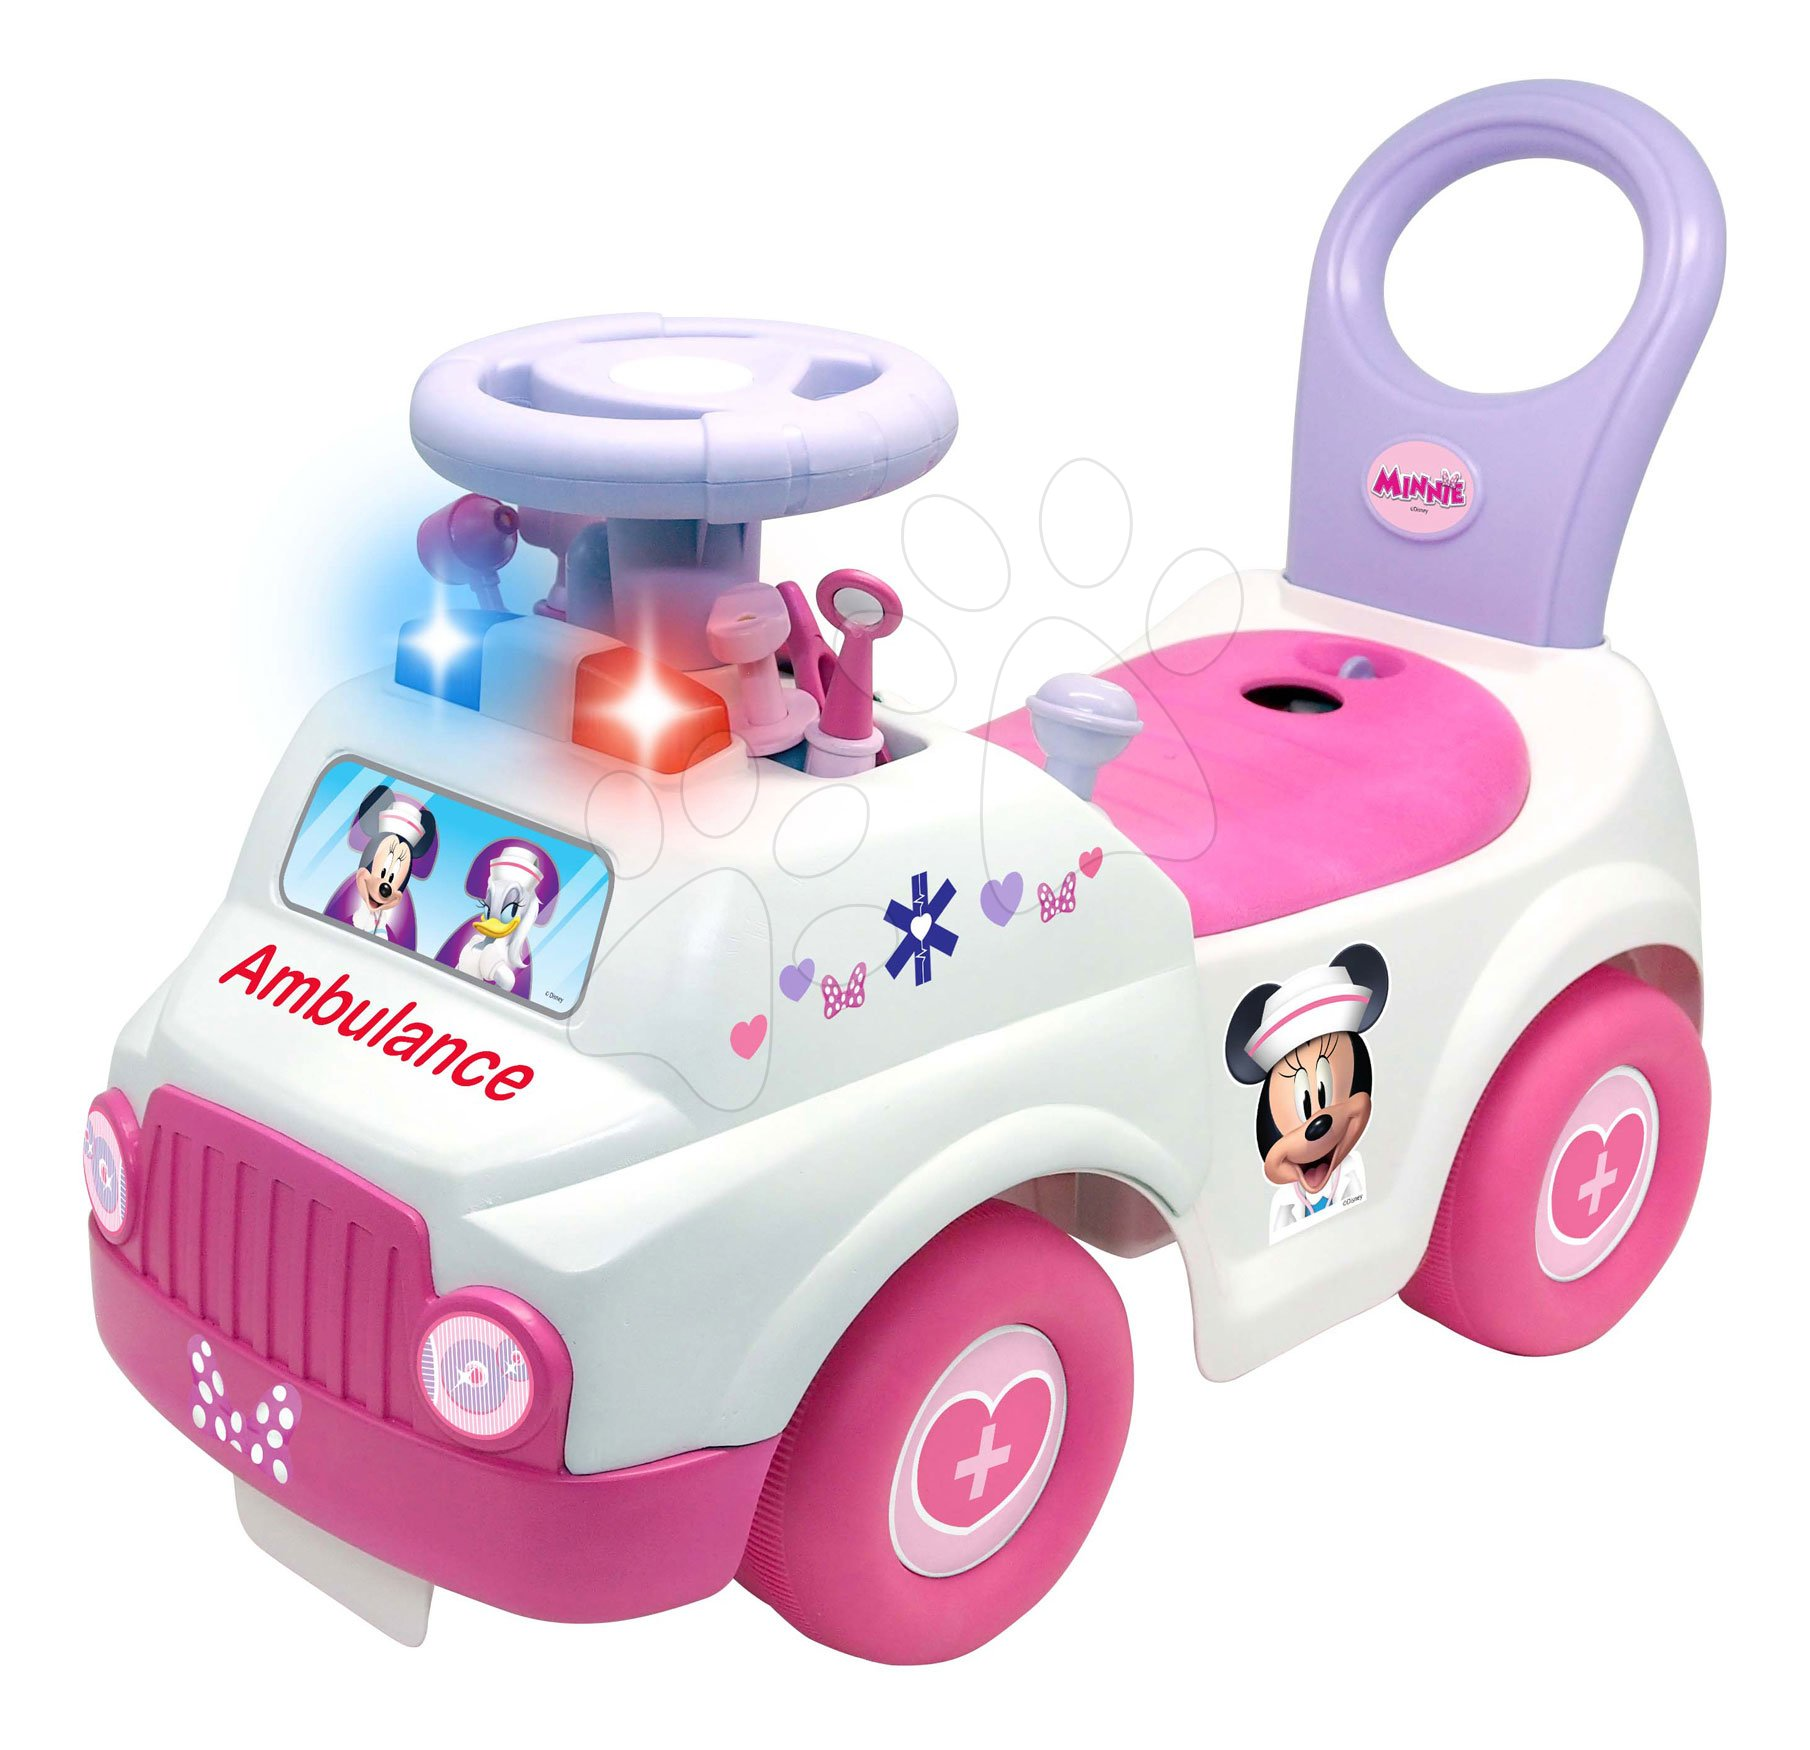 Babytaxiu ambulanță Ambulance Minnie Kiddieland cu 7 accesorii cu sunete și lumini de la 12 luni